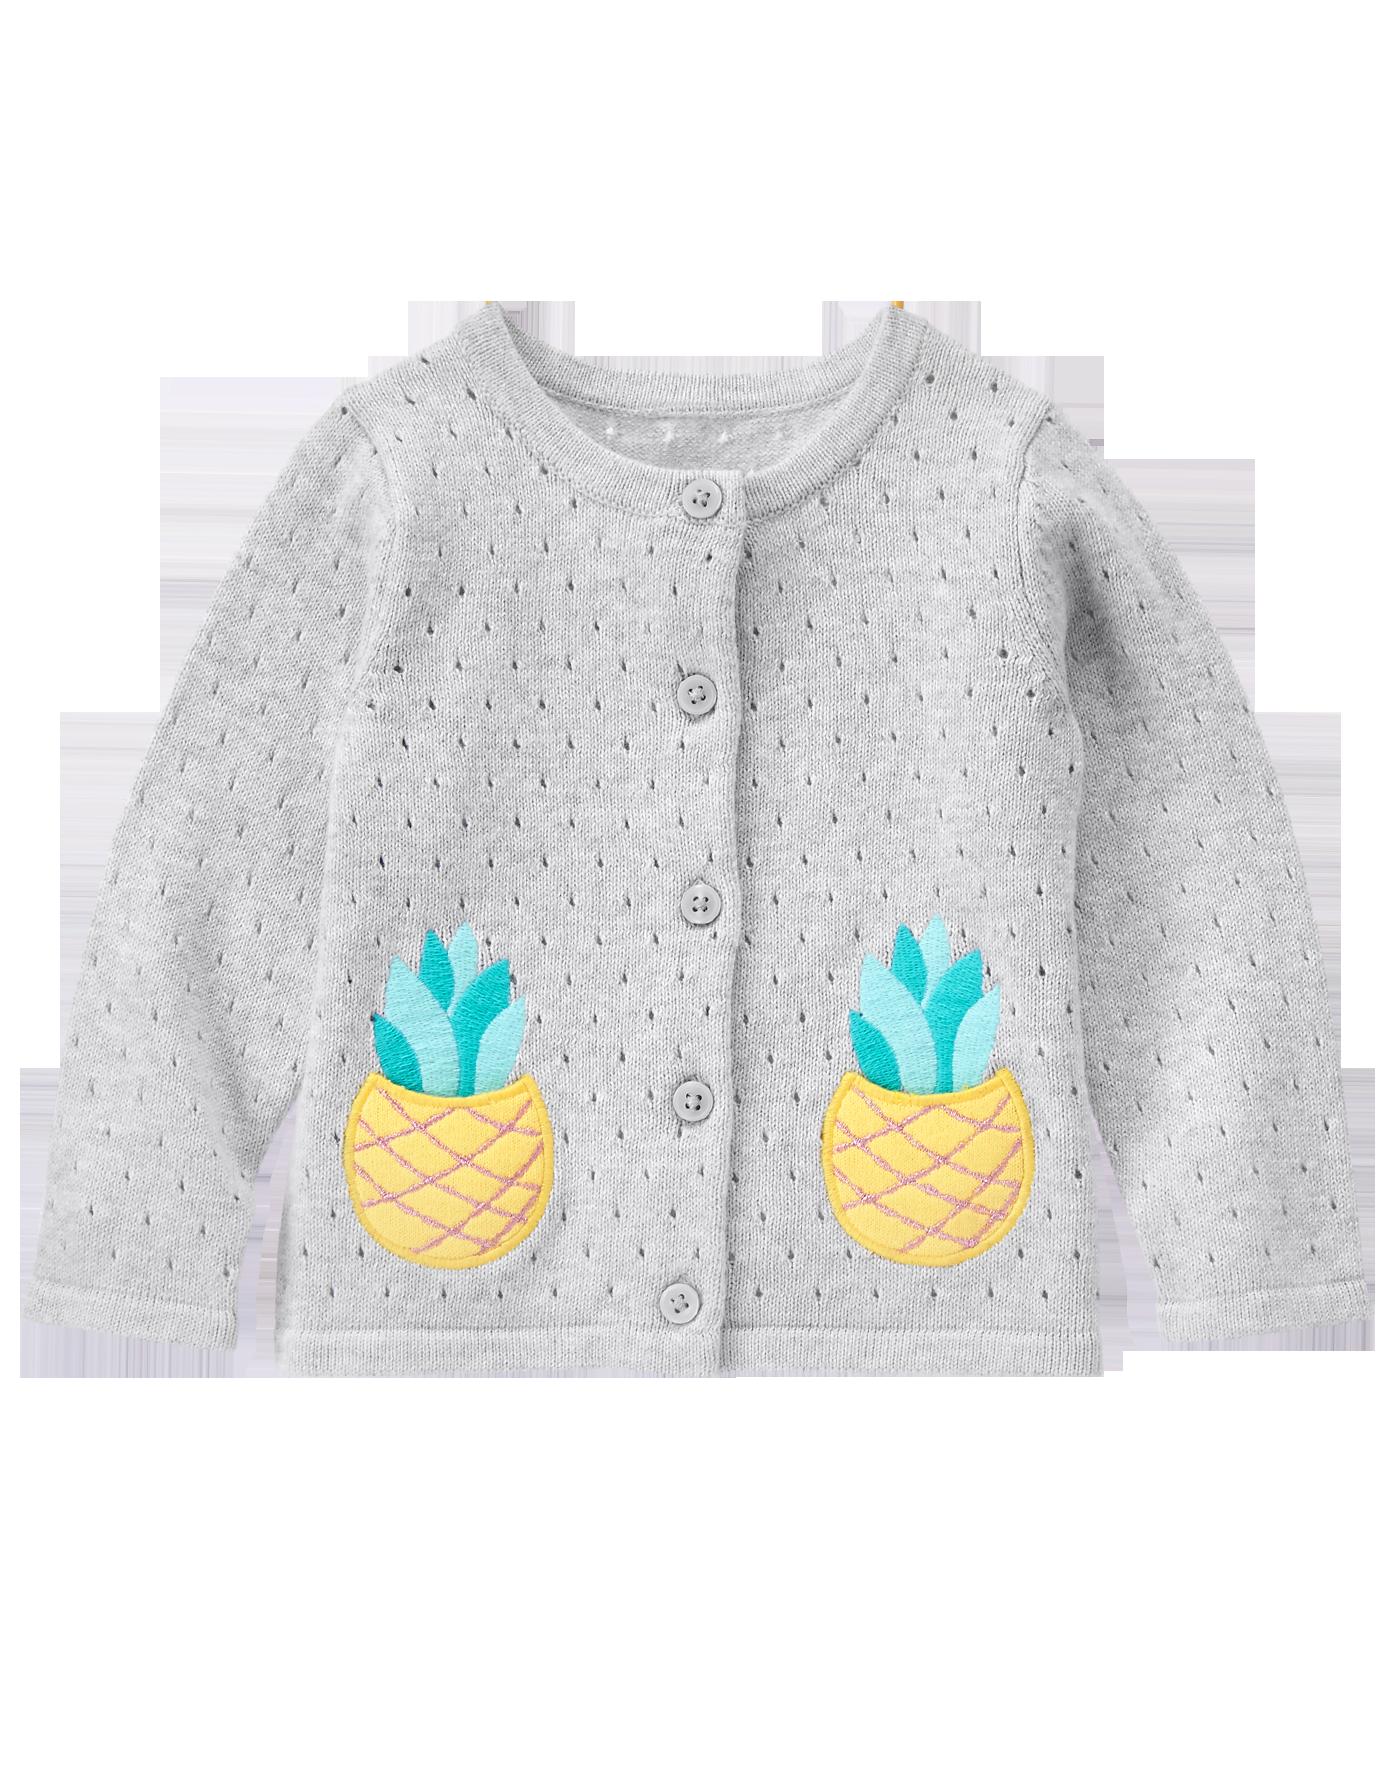 Pineapple Cardigan